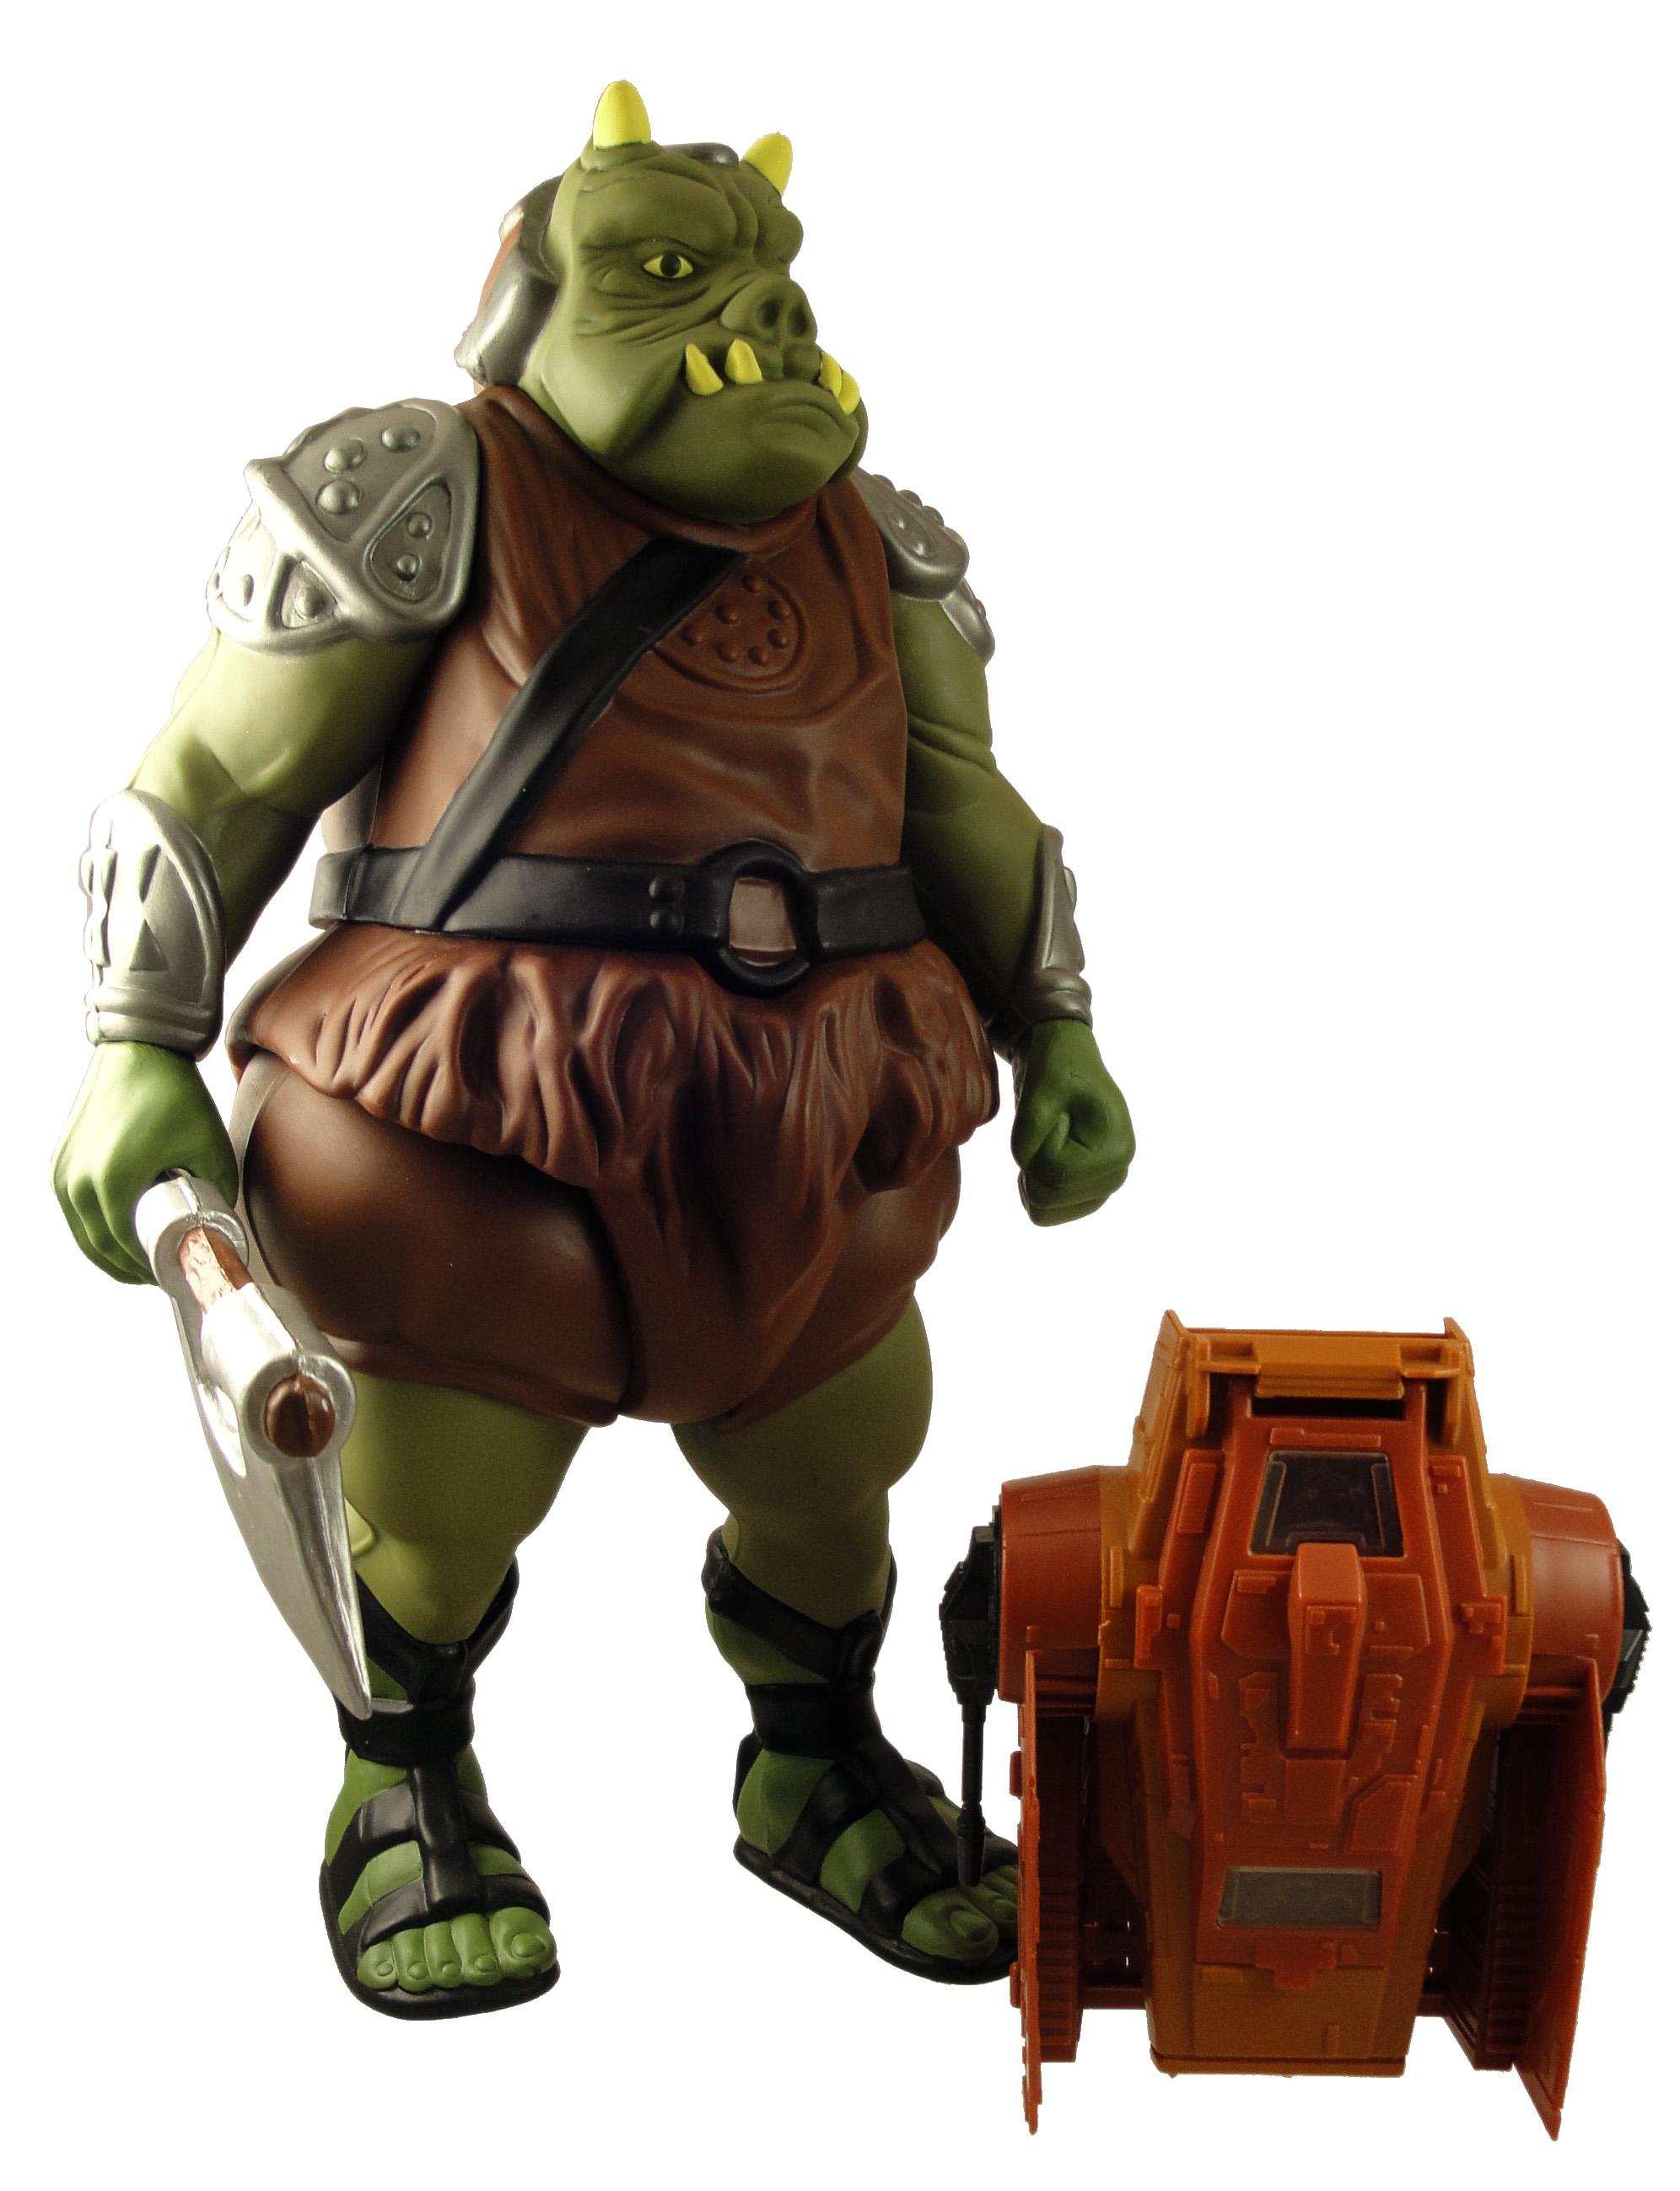 Review star wars jumbo vintage gamorrean guard - Star wars gamorrean guard ...